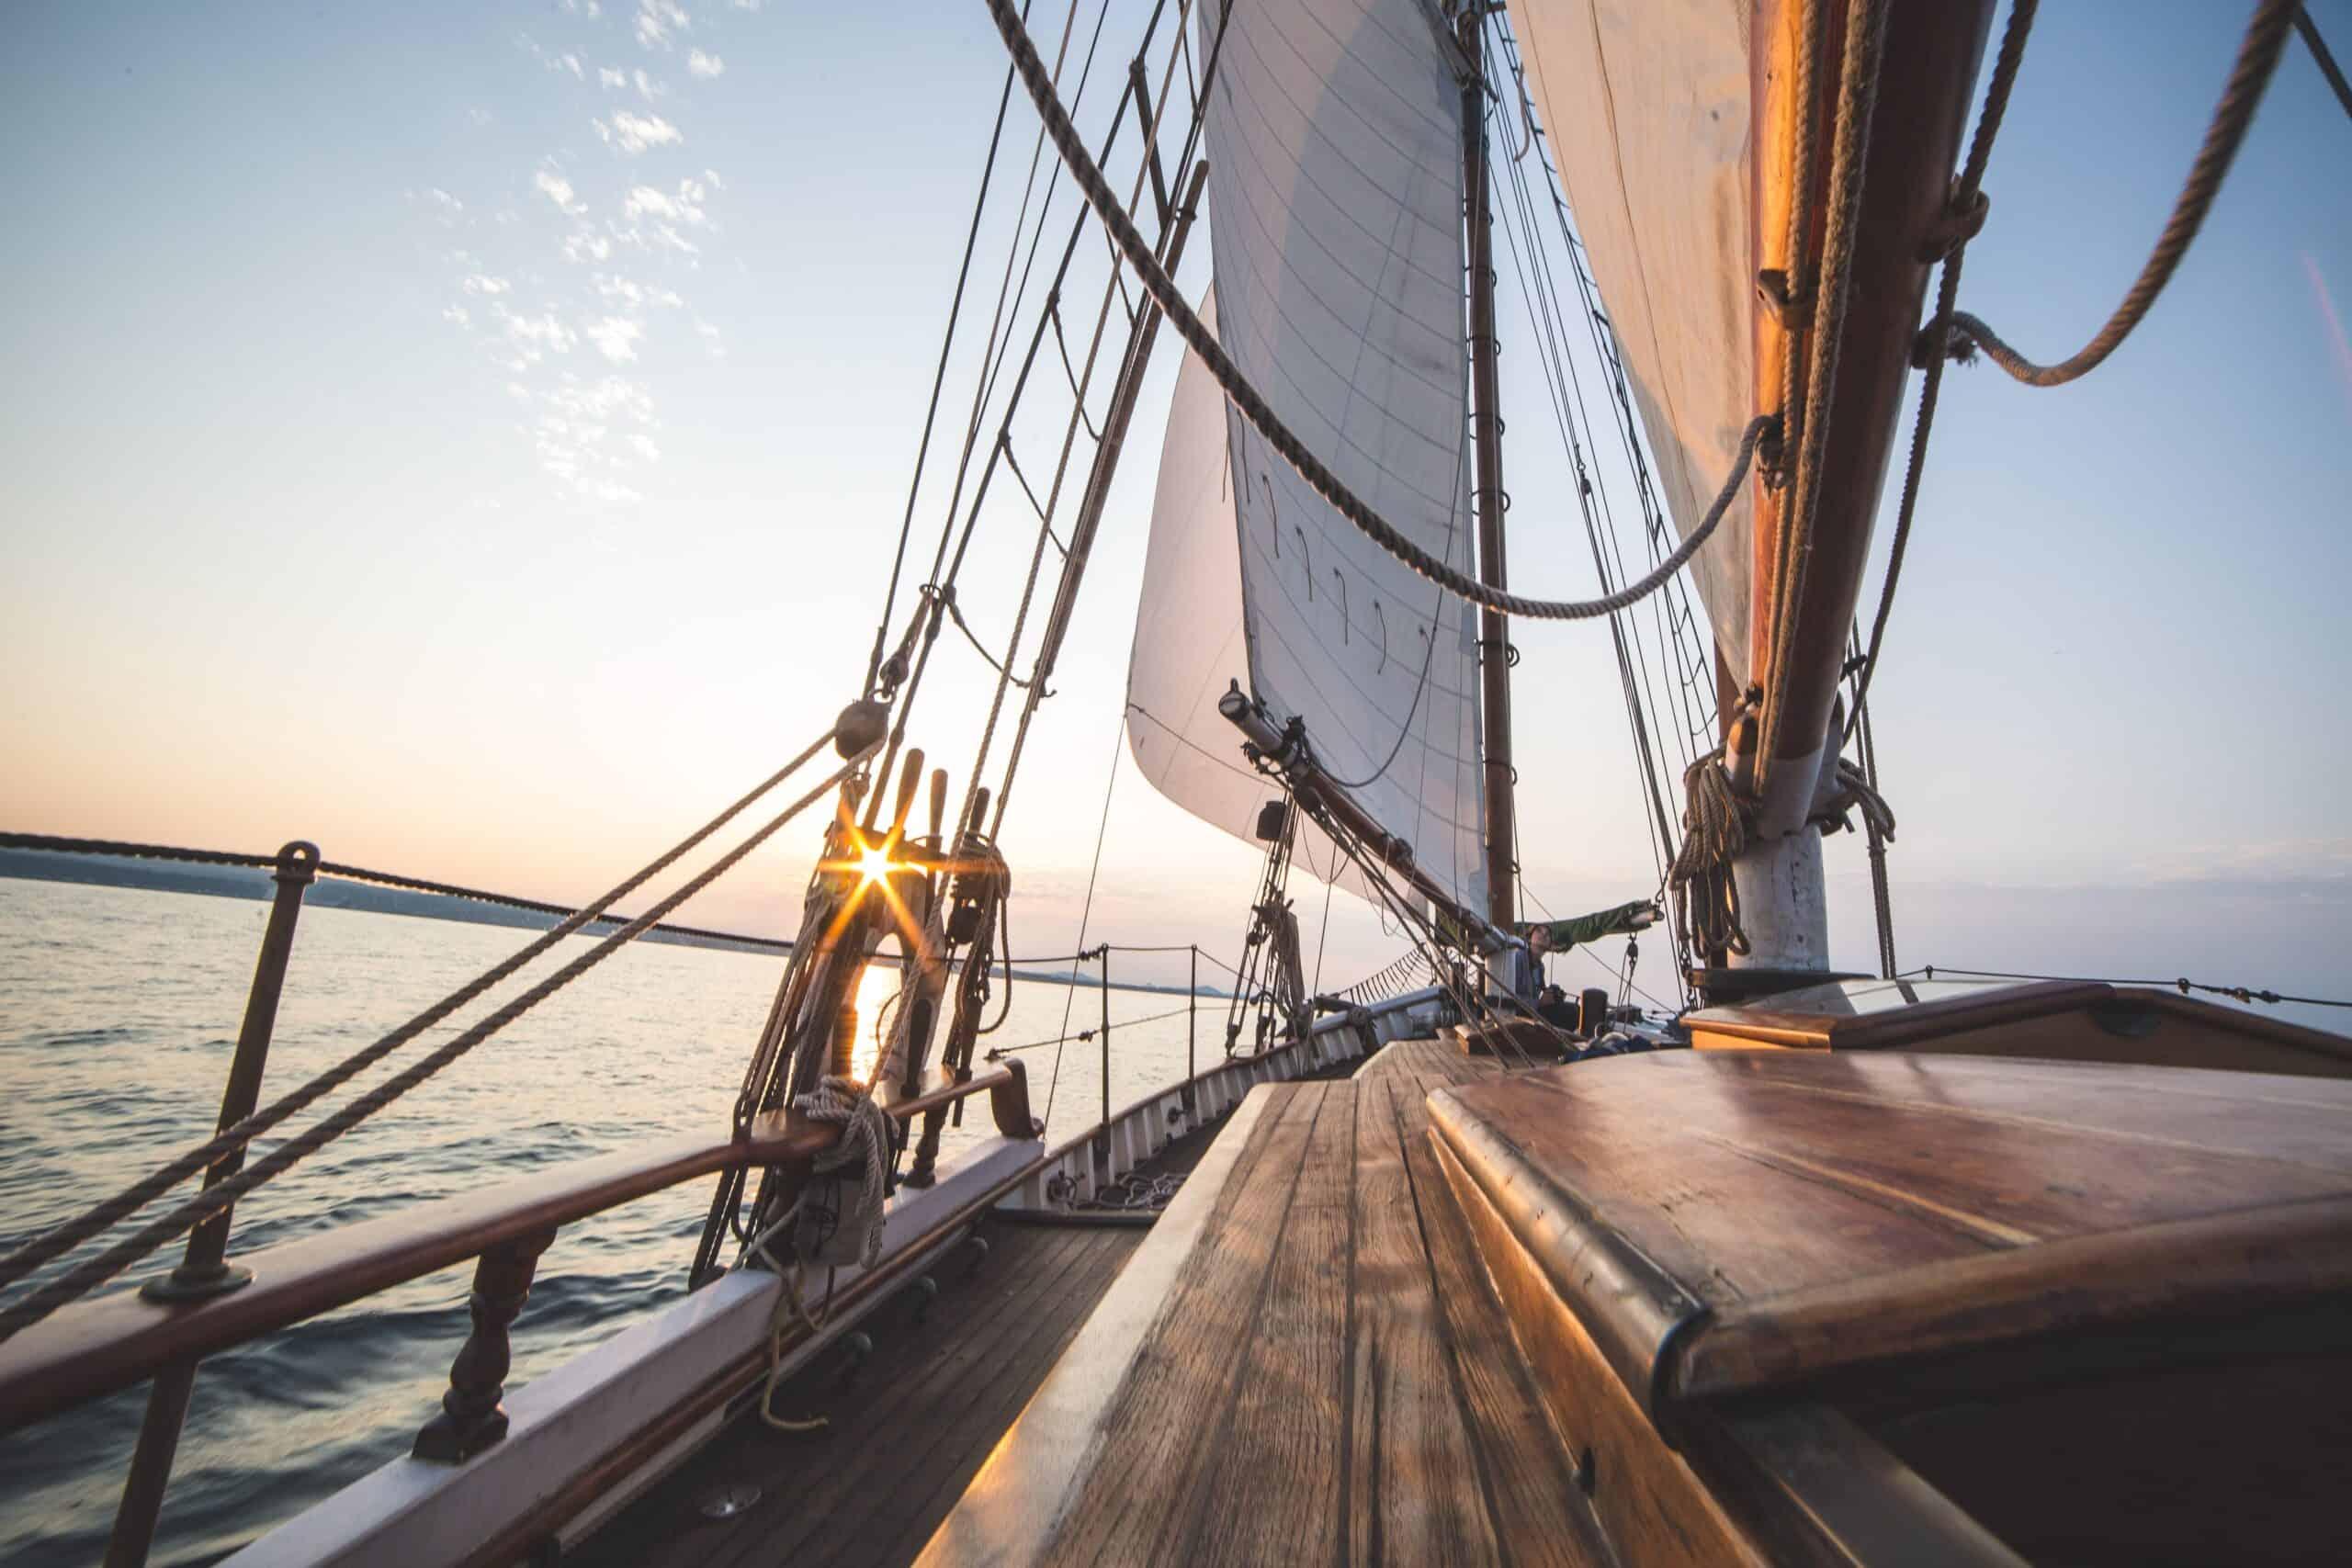 digital marketing for boat tours